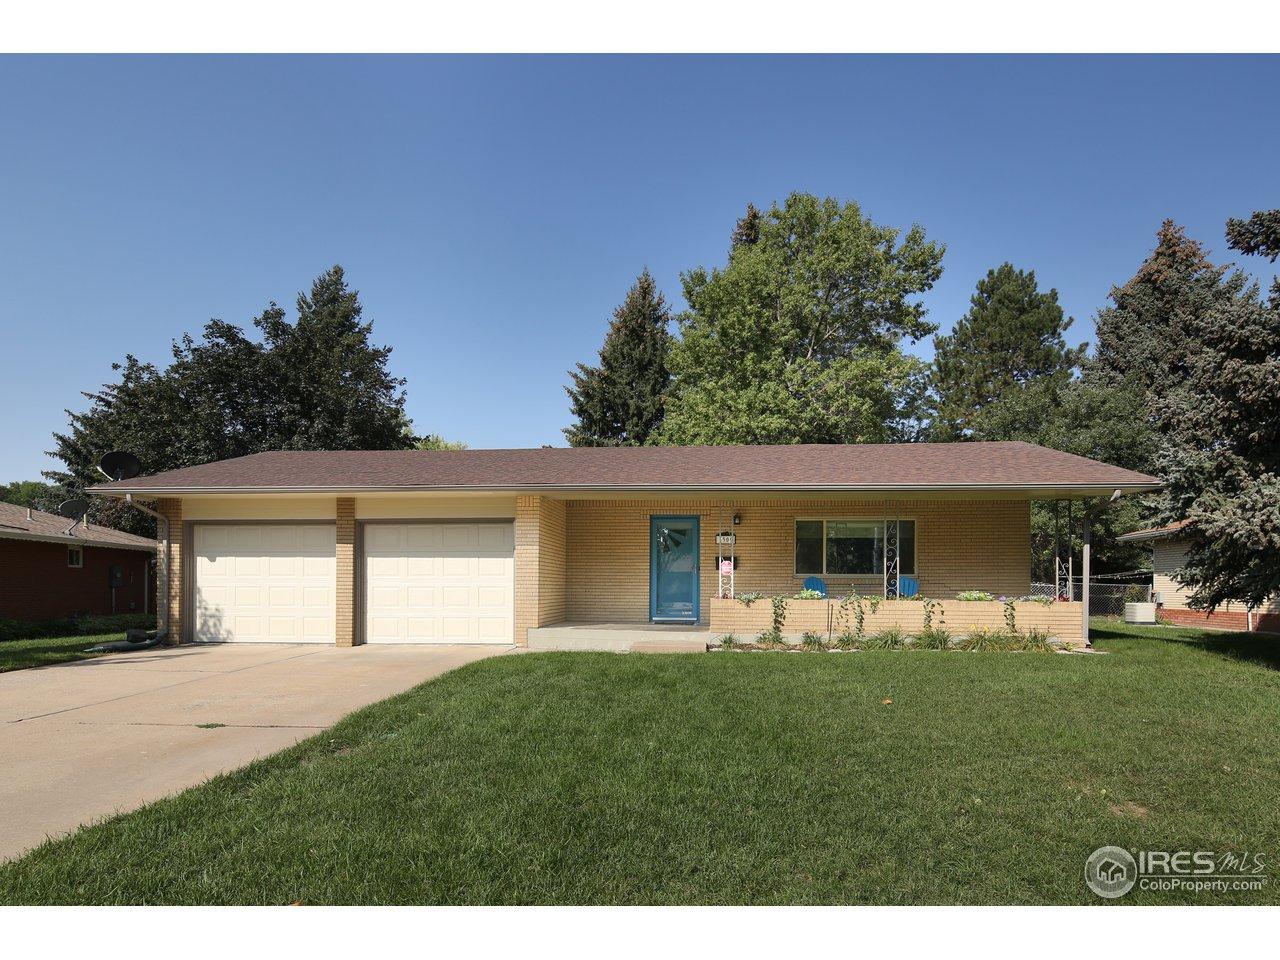 1309 Patton St, Fort Collins CO 80524